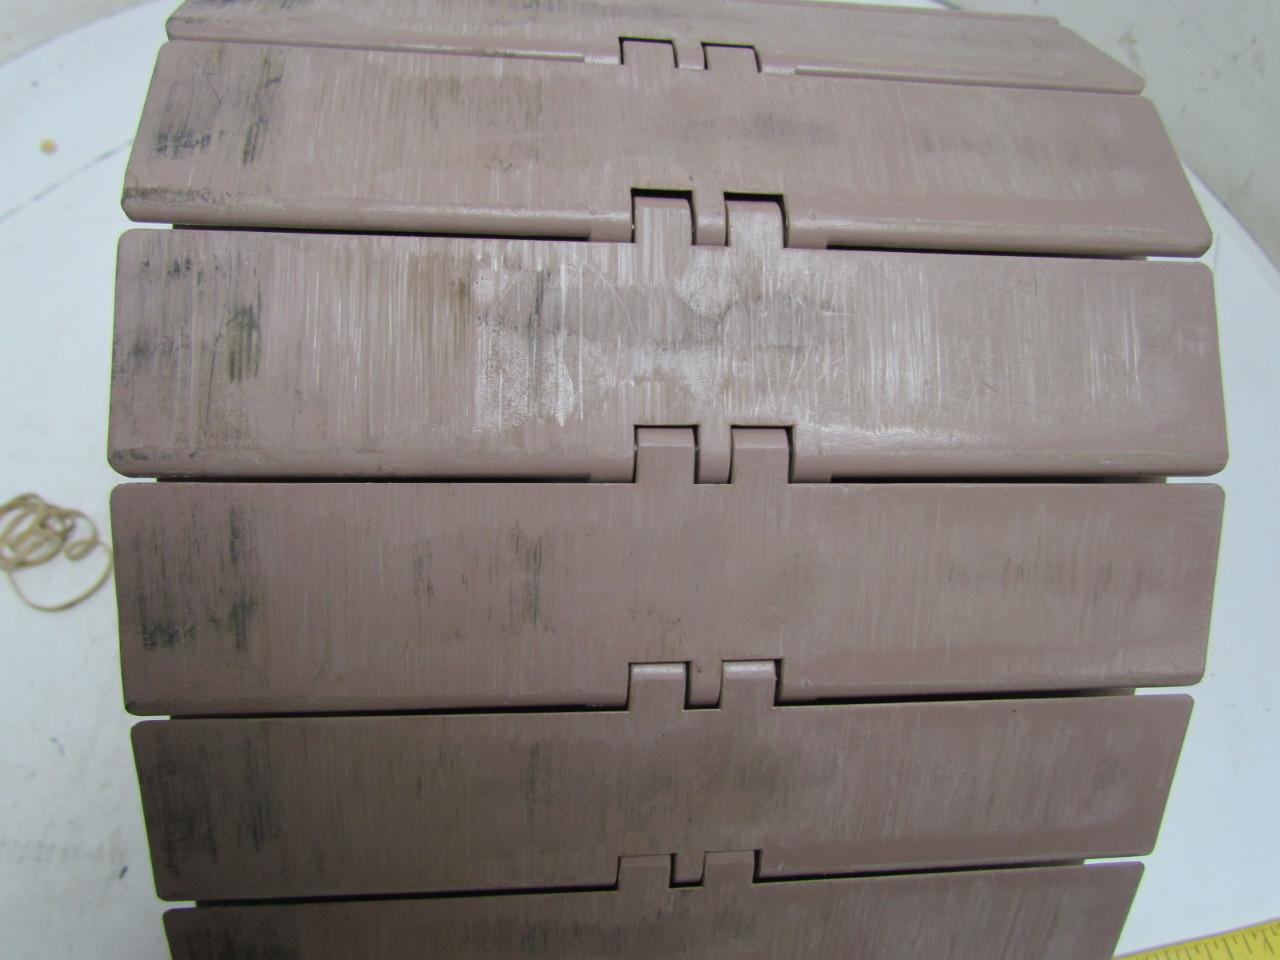 Marbett 820k750 table top conveyor chain 7 1 2 x 10 39 l 1 1 for 1 x 2 table